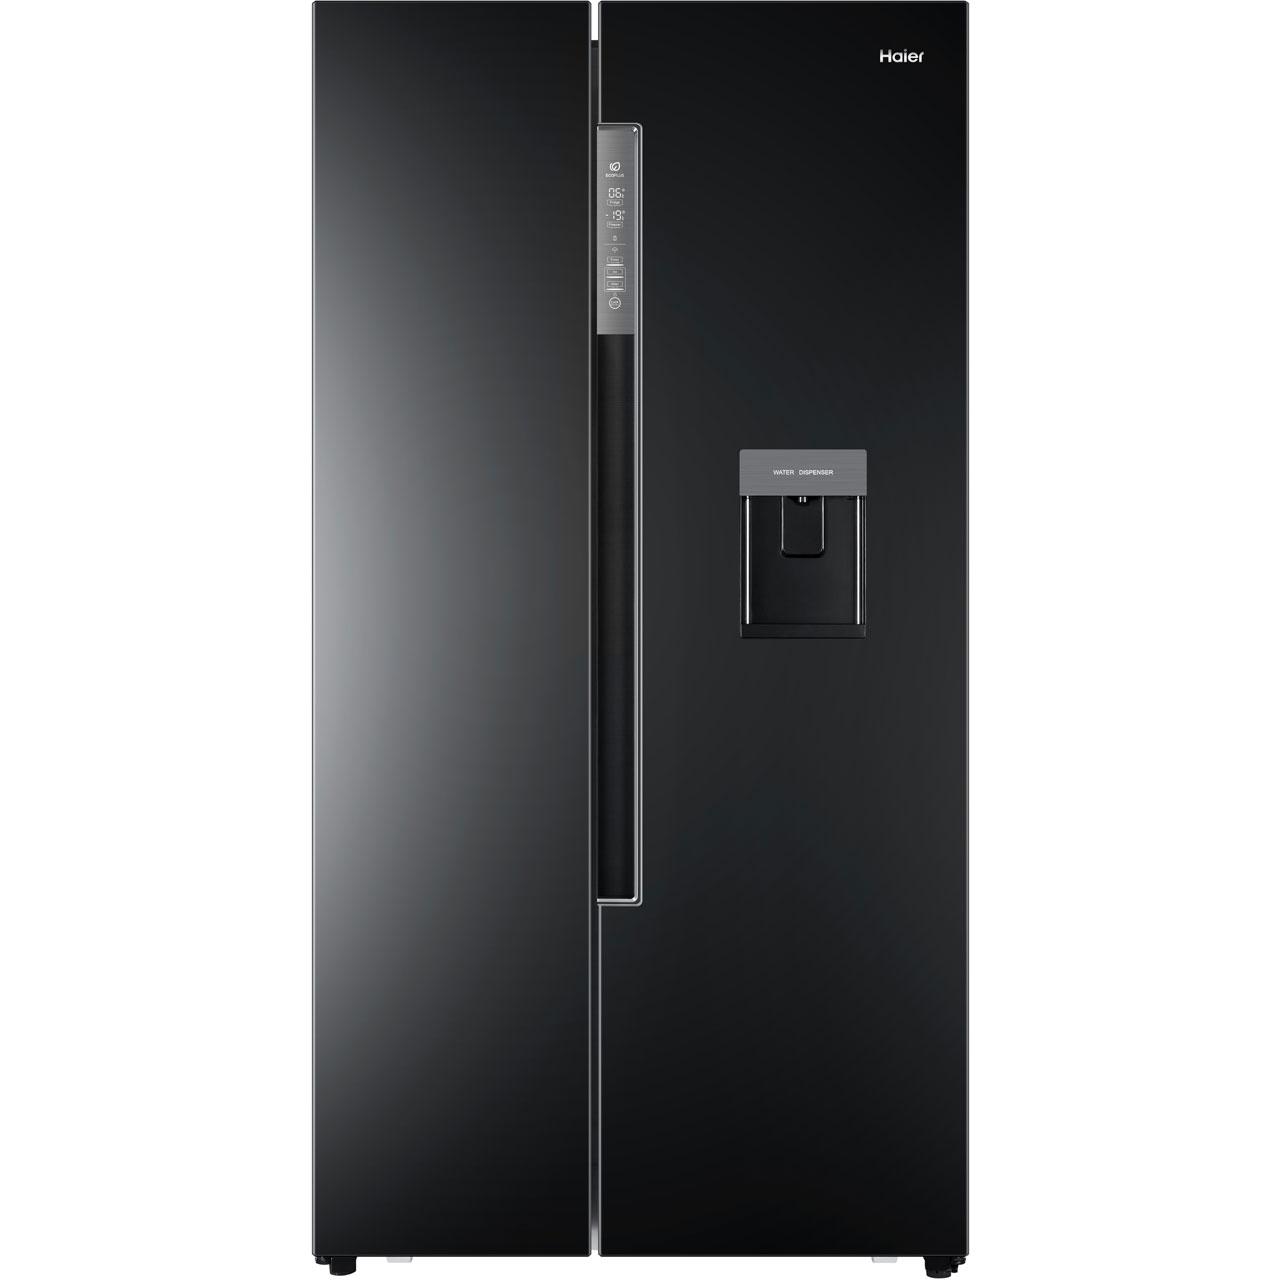 haier american fridge freezer. haier hrf-522ib6 american fridge freezer - black